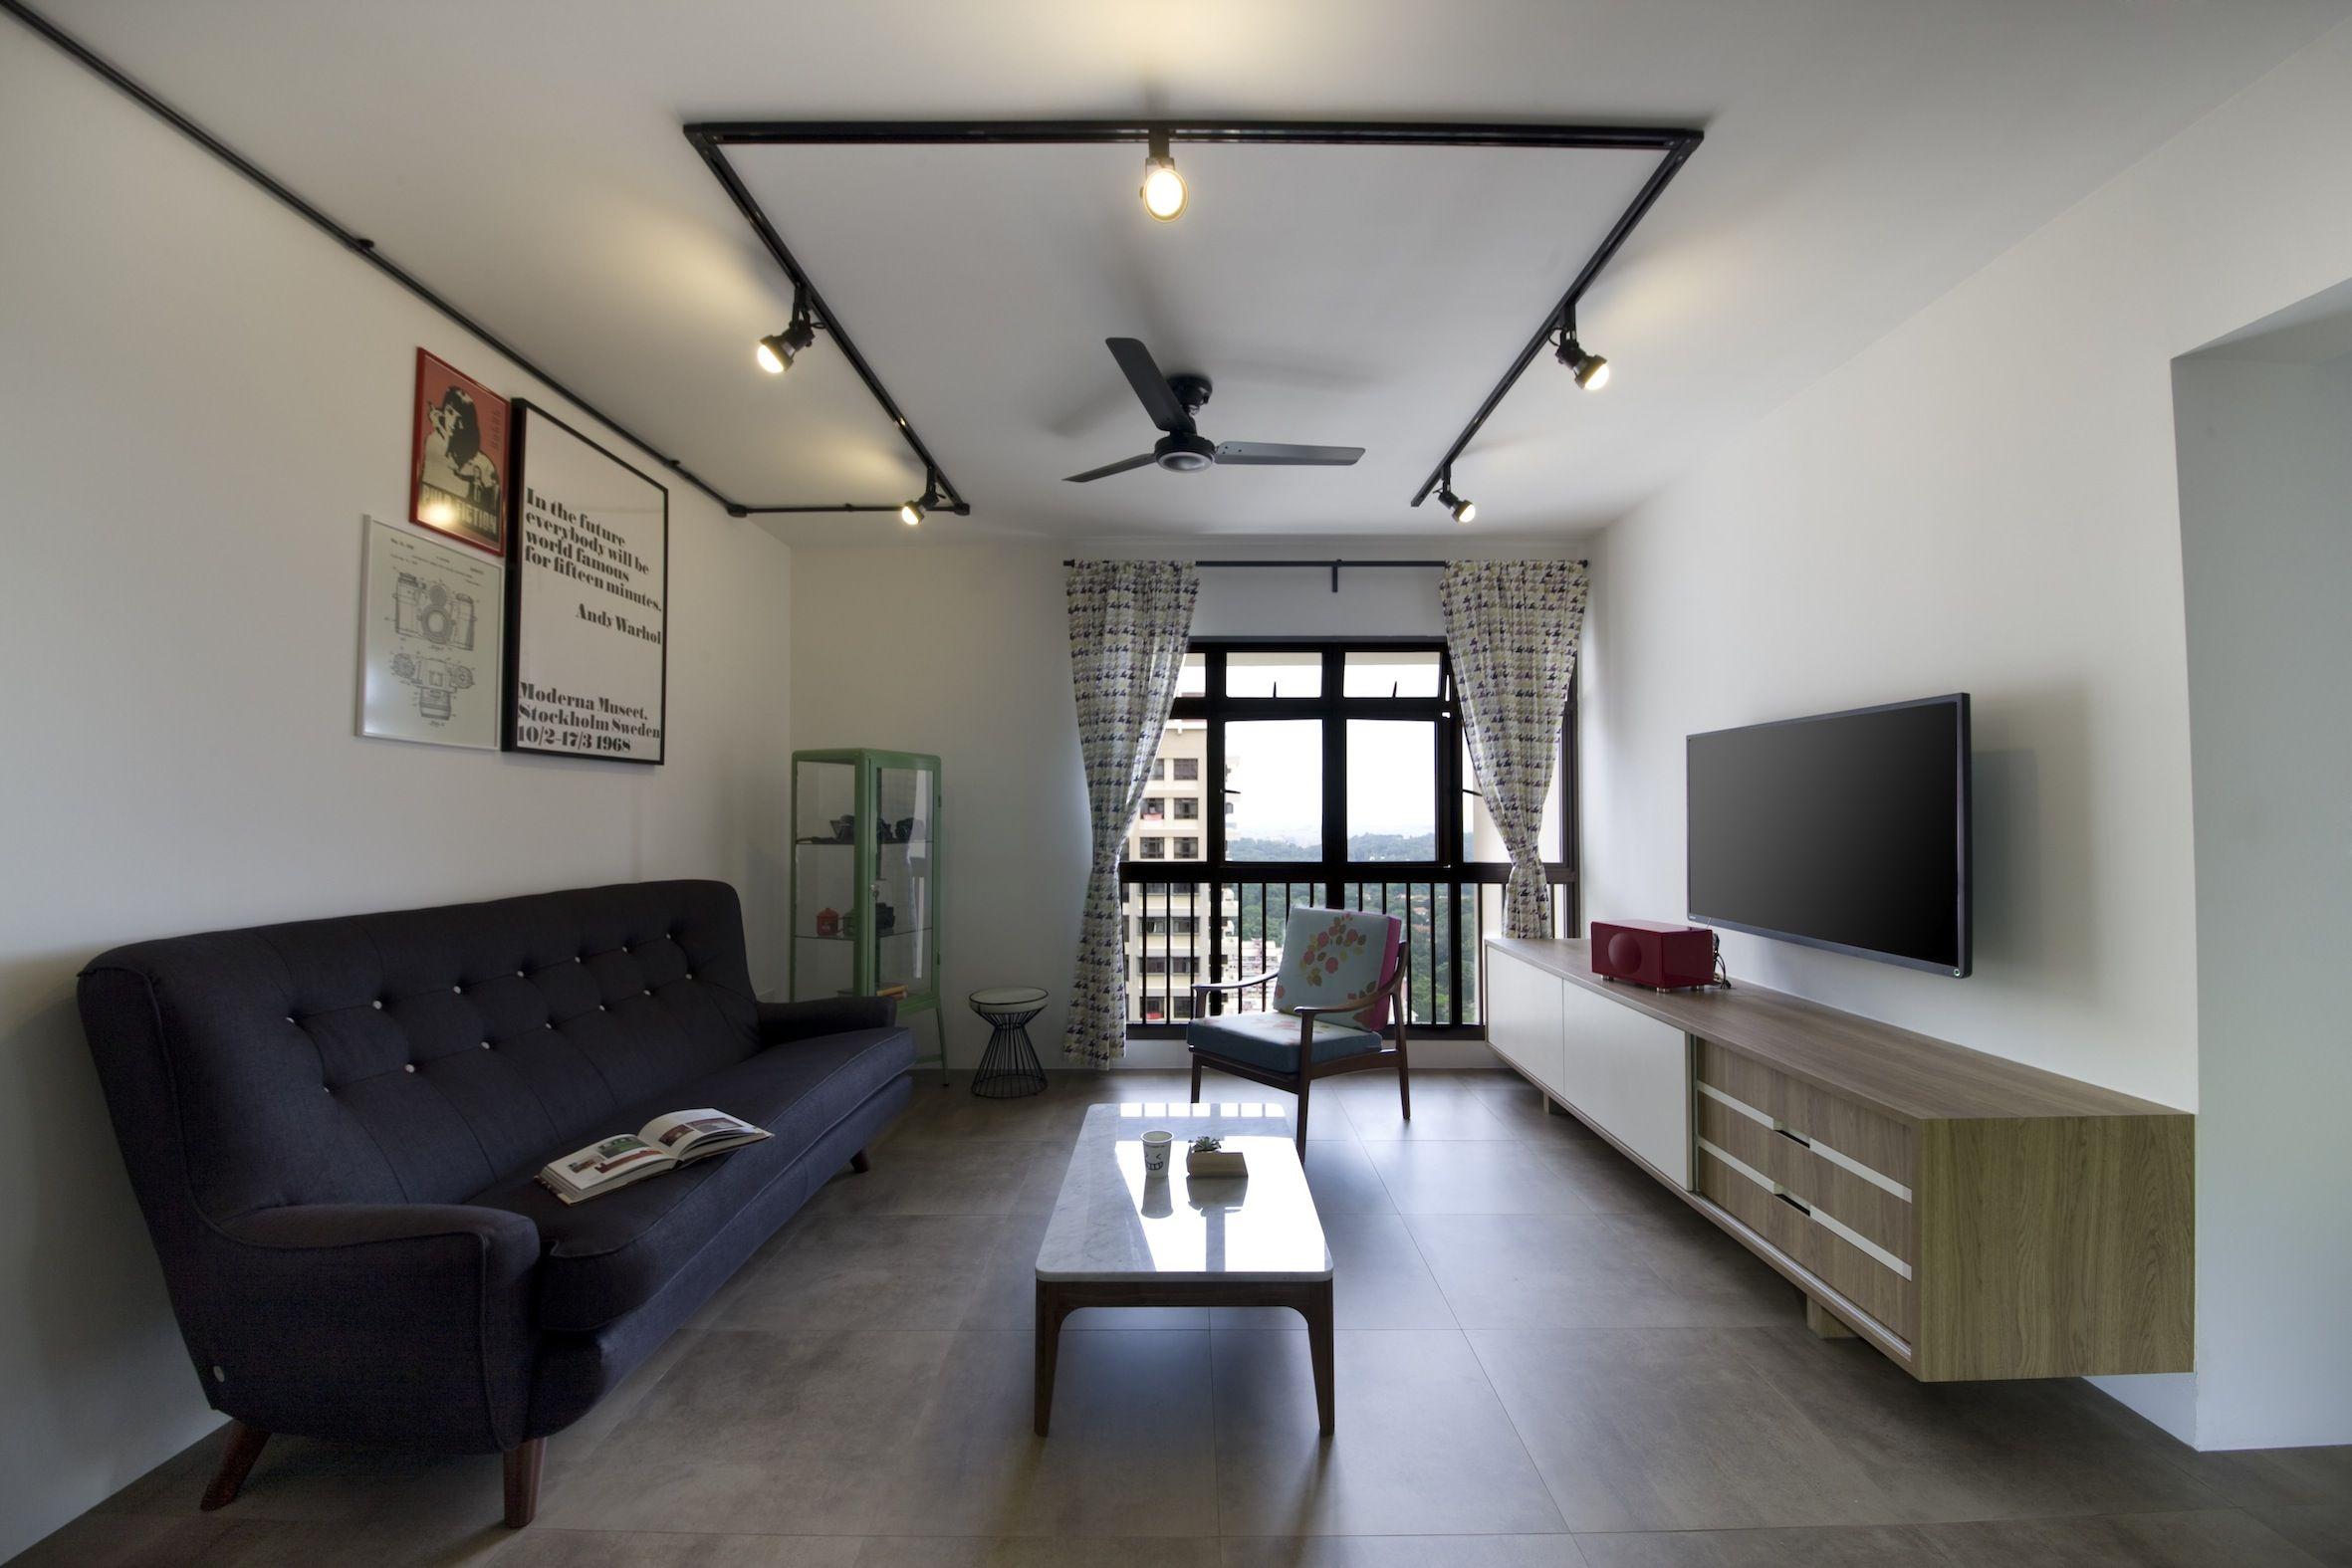 Tanglin Halt 4 Rooms Hdb  Home & Decor Singapore  Ideas For The Inspiration Hdb 4 Room Living Room Design Decorating Inspiration